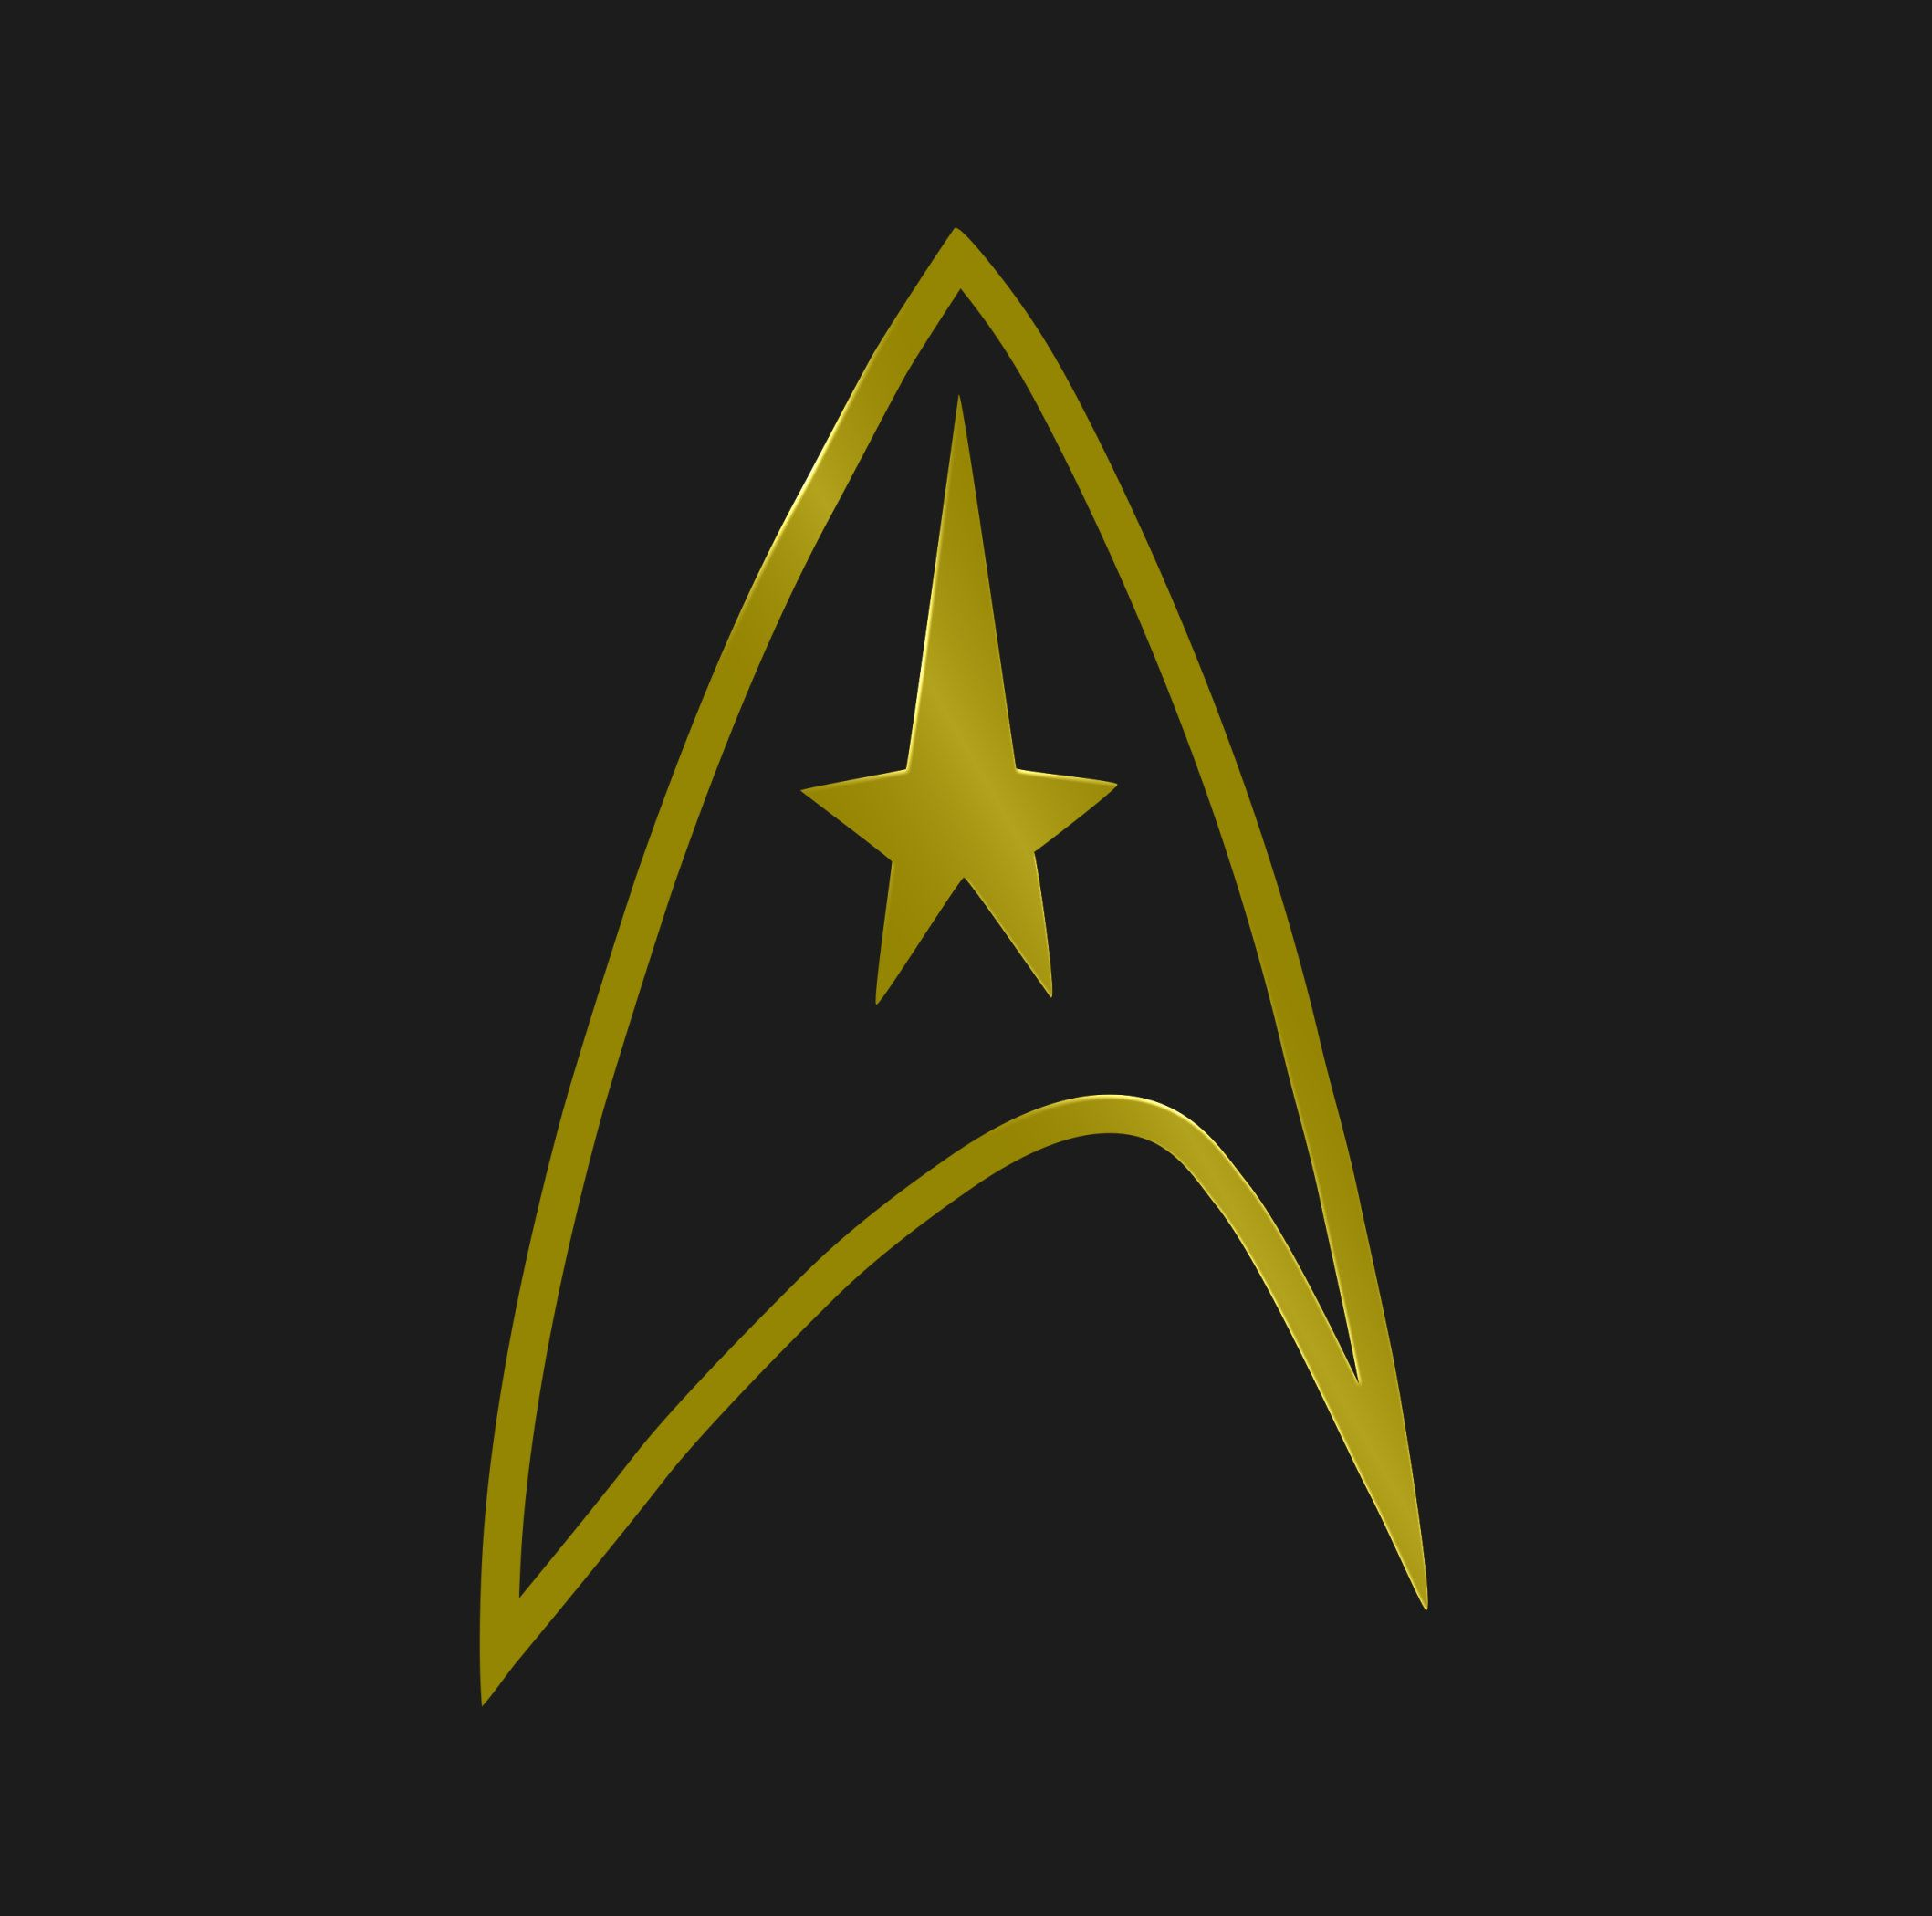 Star Trek Decal Starfleet Insignia Sticker Car Truck Laptop Tablet Helmet Toolbox Decor In Various Colors And Sizes Nature Decal Vinyl Decals Star Trek Gifts [ 2100 x 2117 Pixel ]